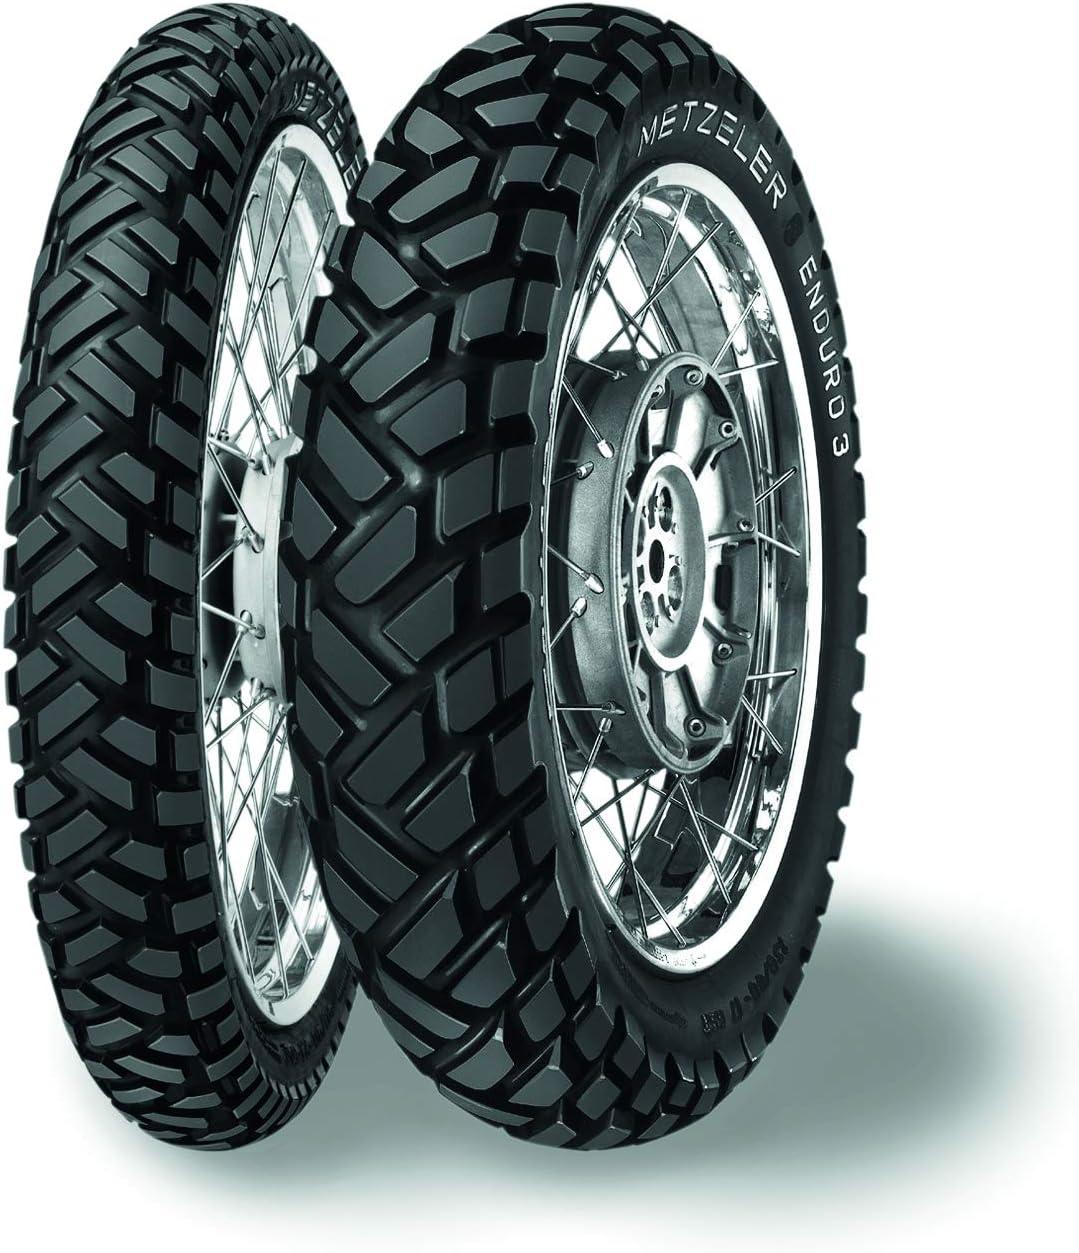 METZELER Enduro 3 Sahara Front Tire (90/90H21 TL)